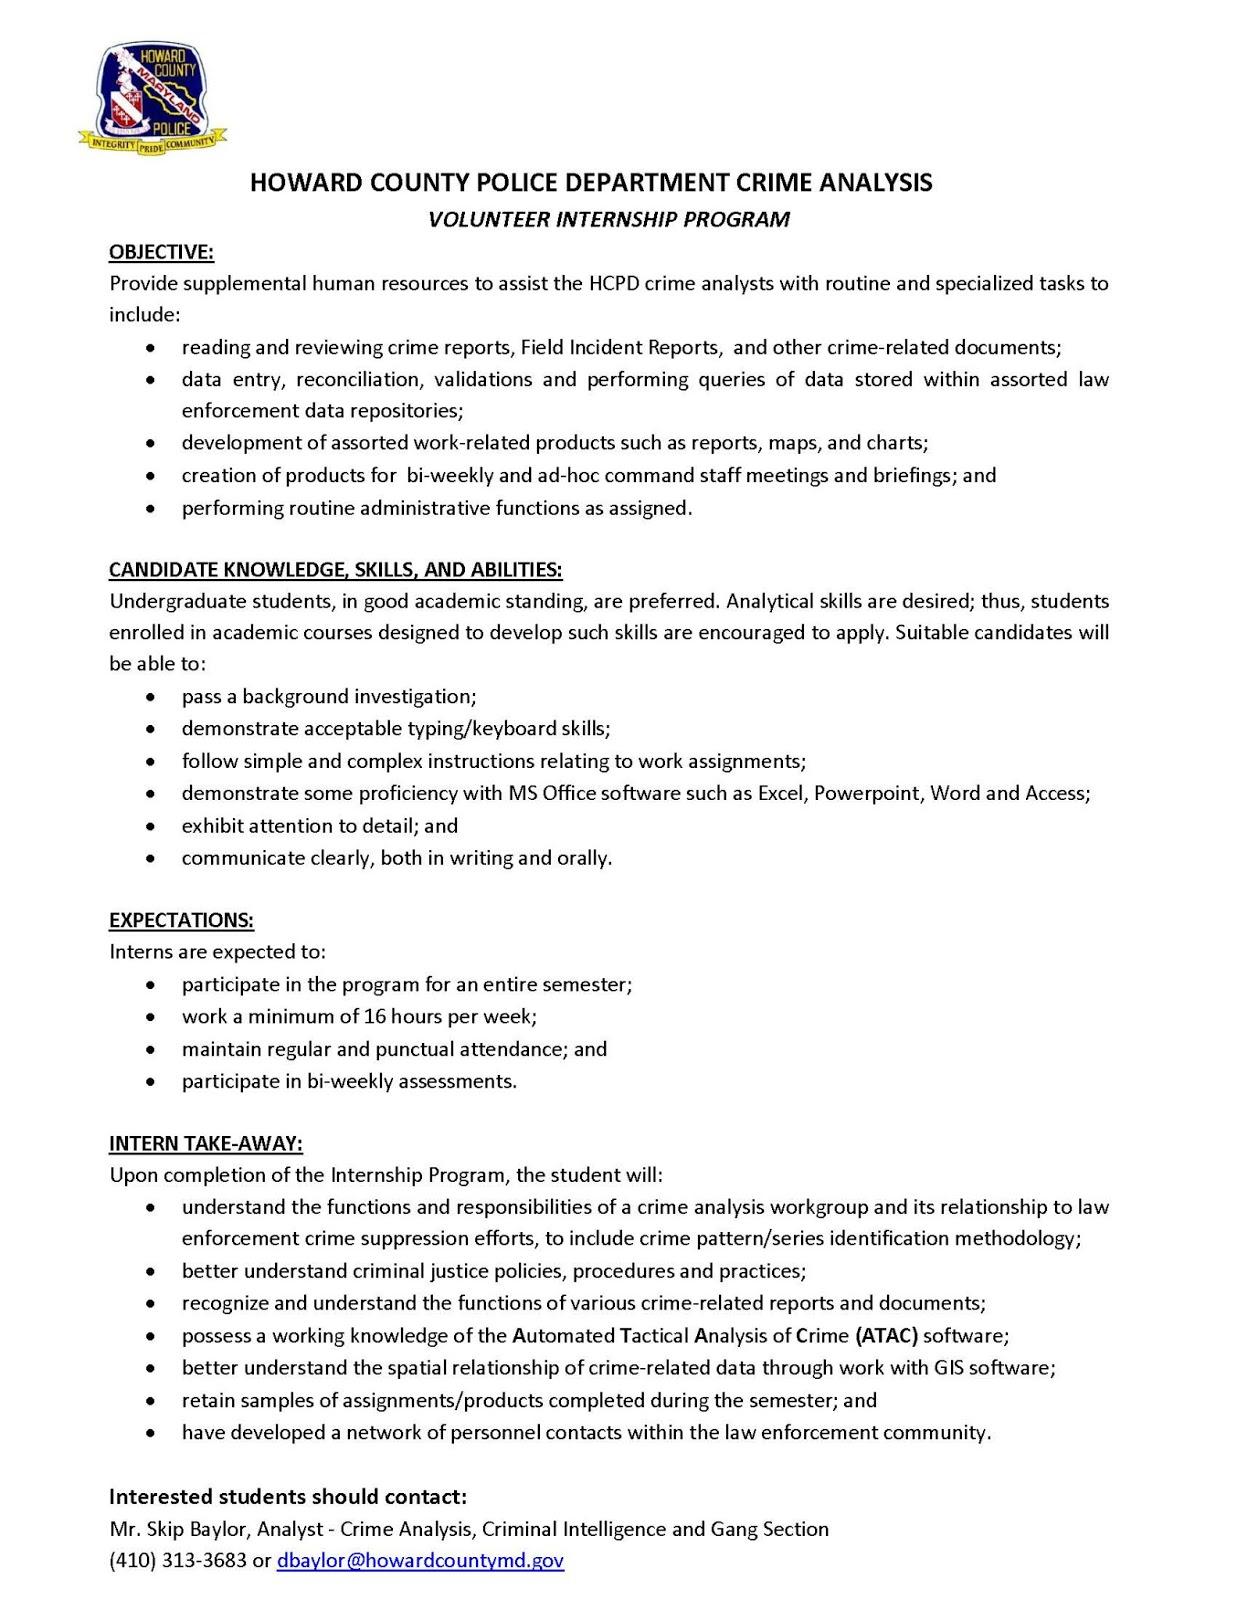 CCJS Undergrad Blog Internship Opportunity Howard County